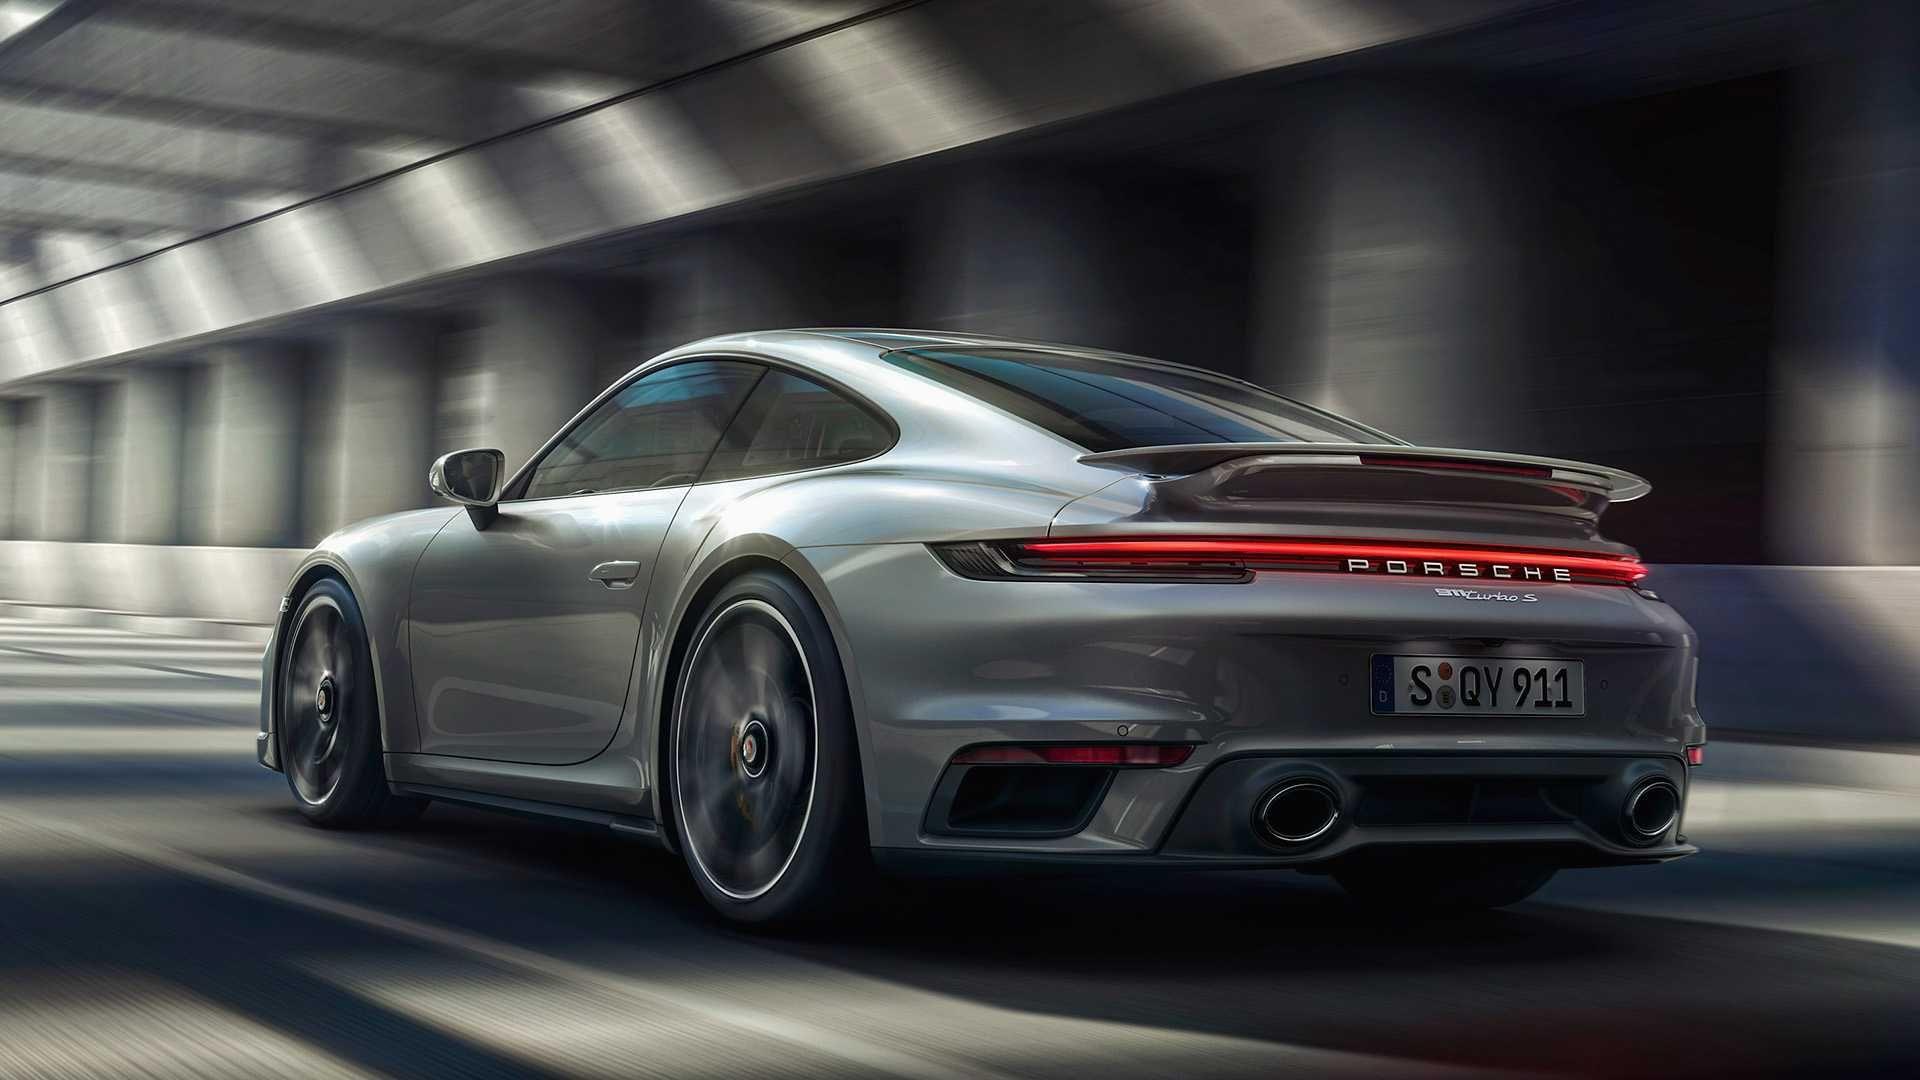 Porsche-911-Turbo-S-2020-3